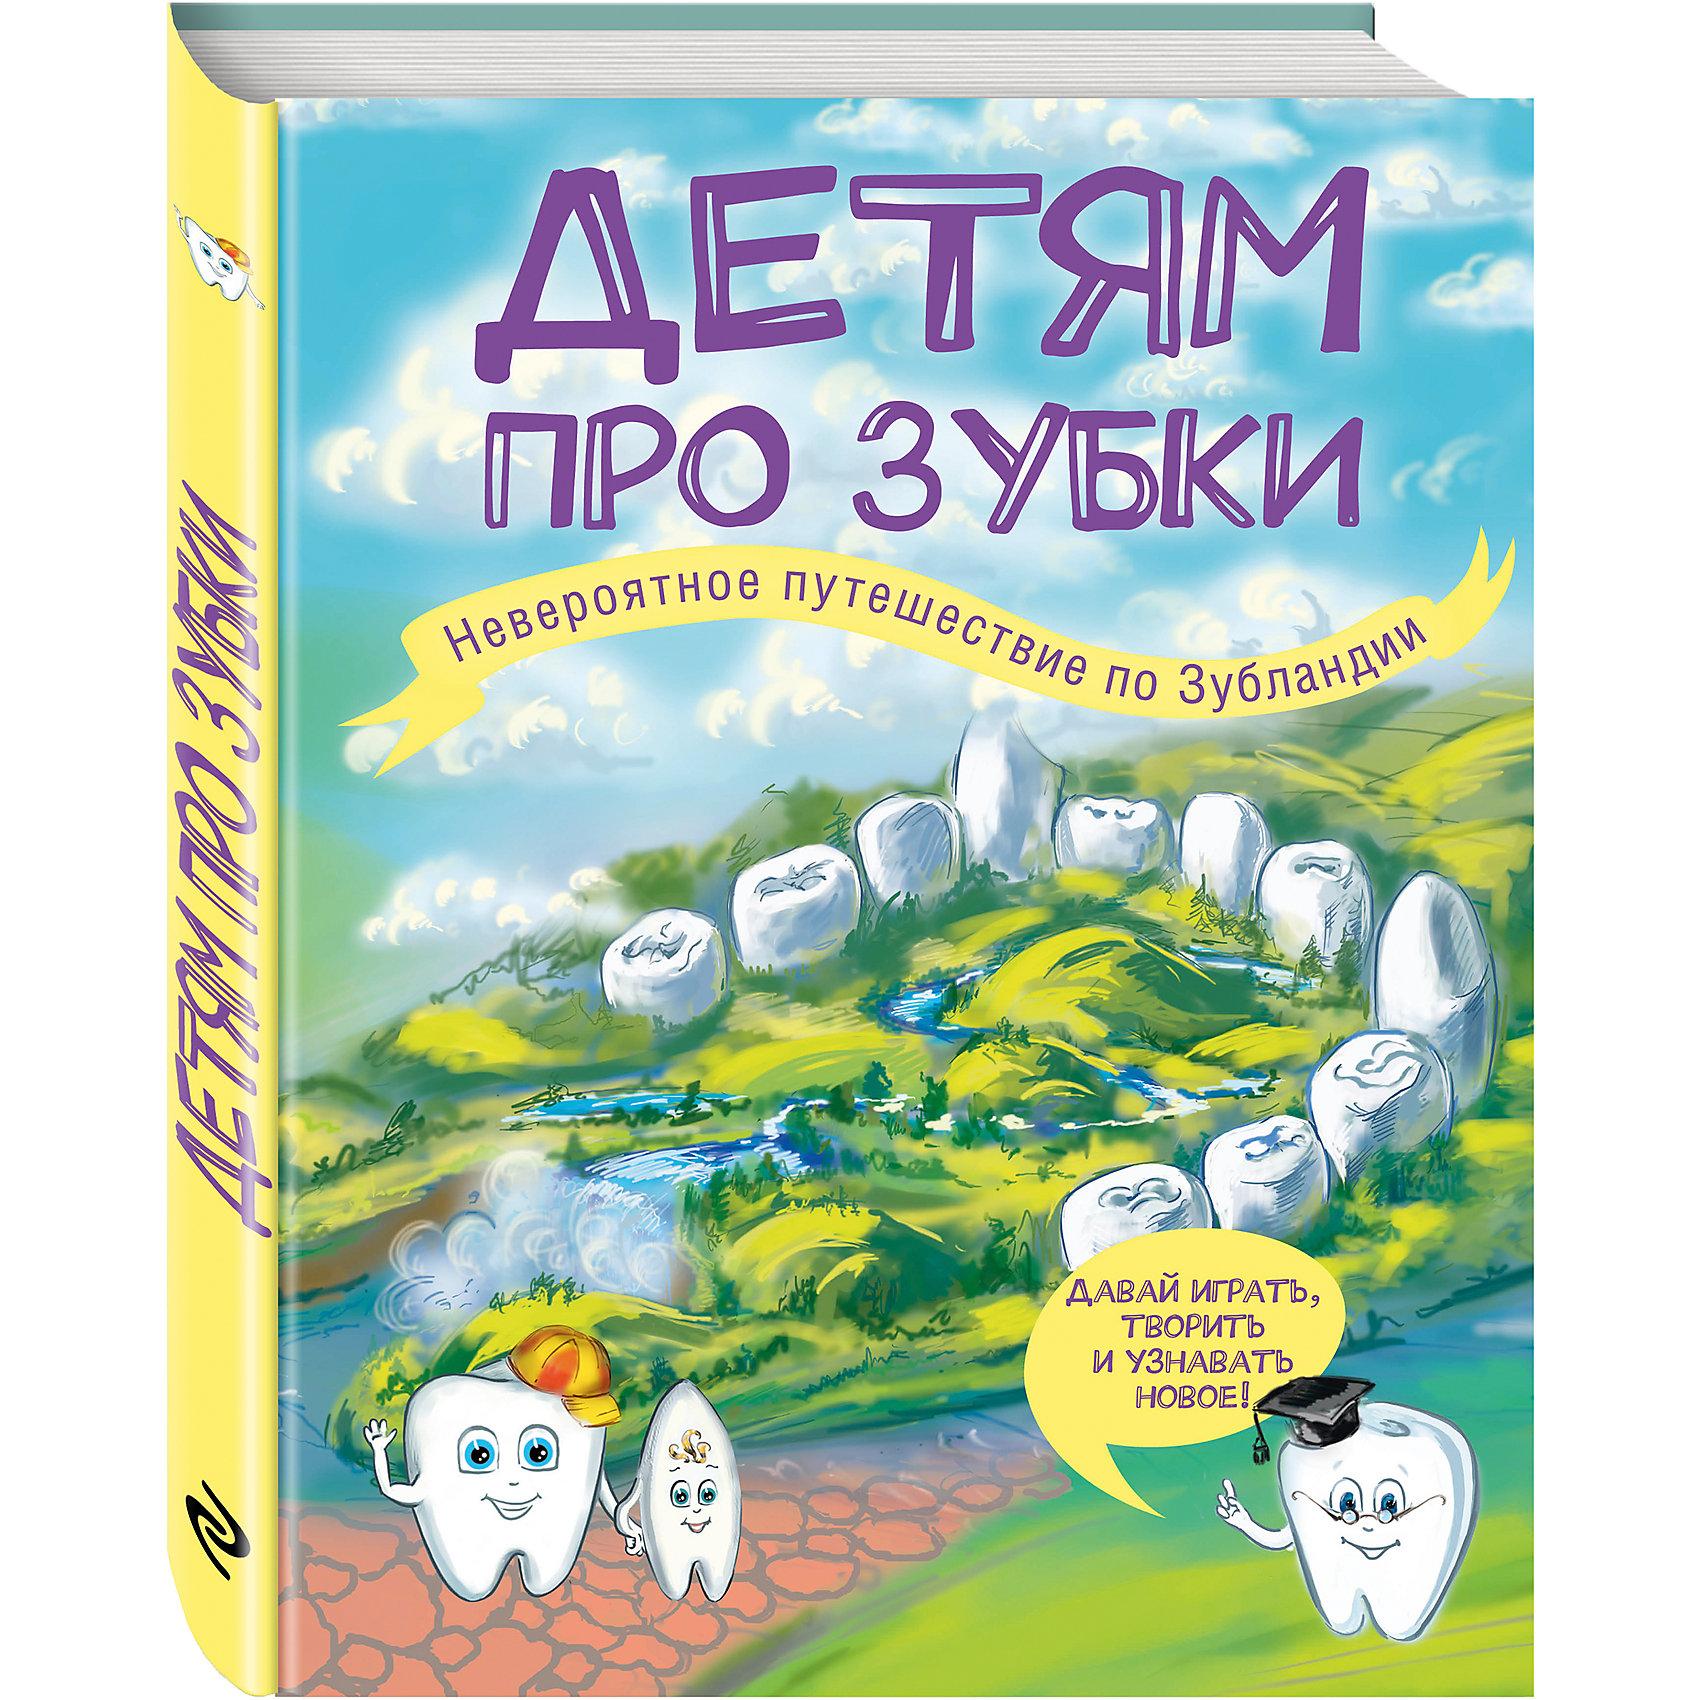 http://mytoysgroup.scene7.com/is/image/myToys/ext/4753532-01.jpg$x$